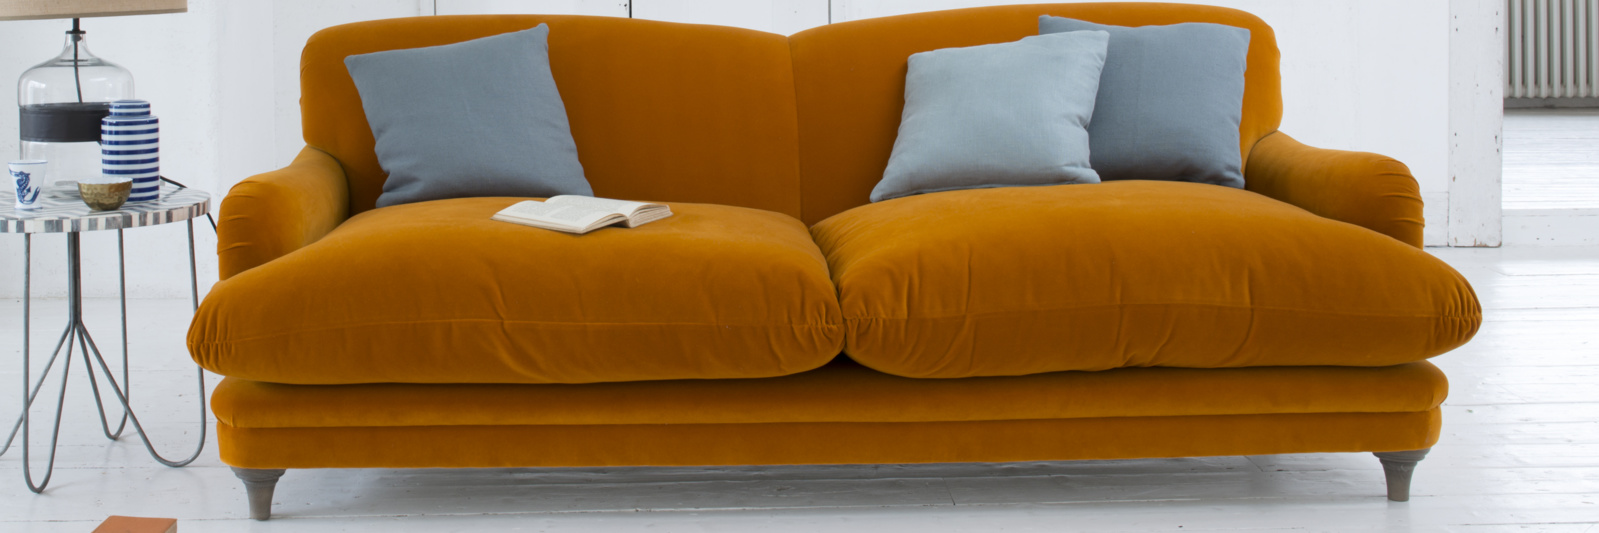 Orange velvet Pudding sofa